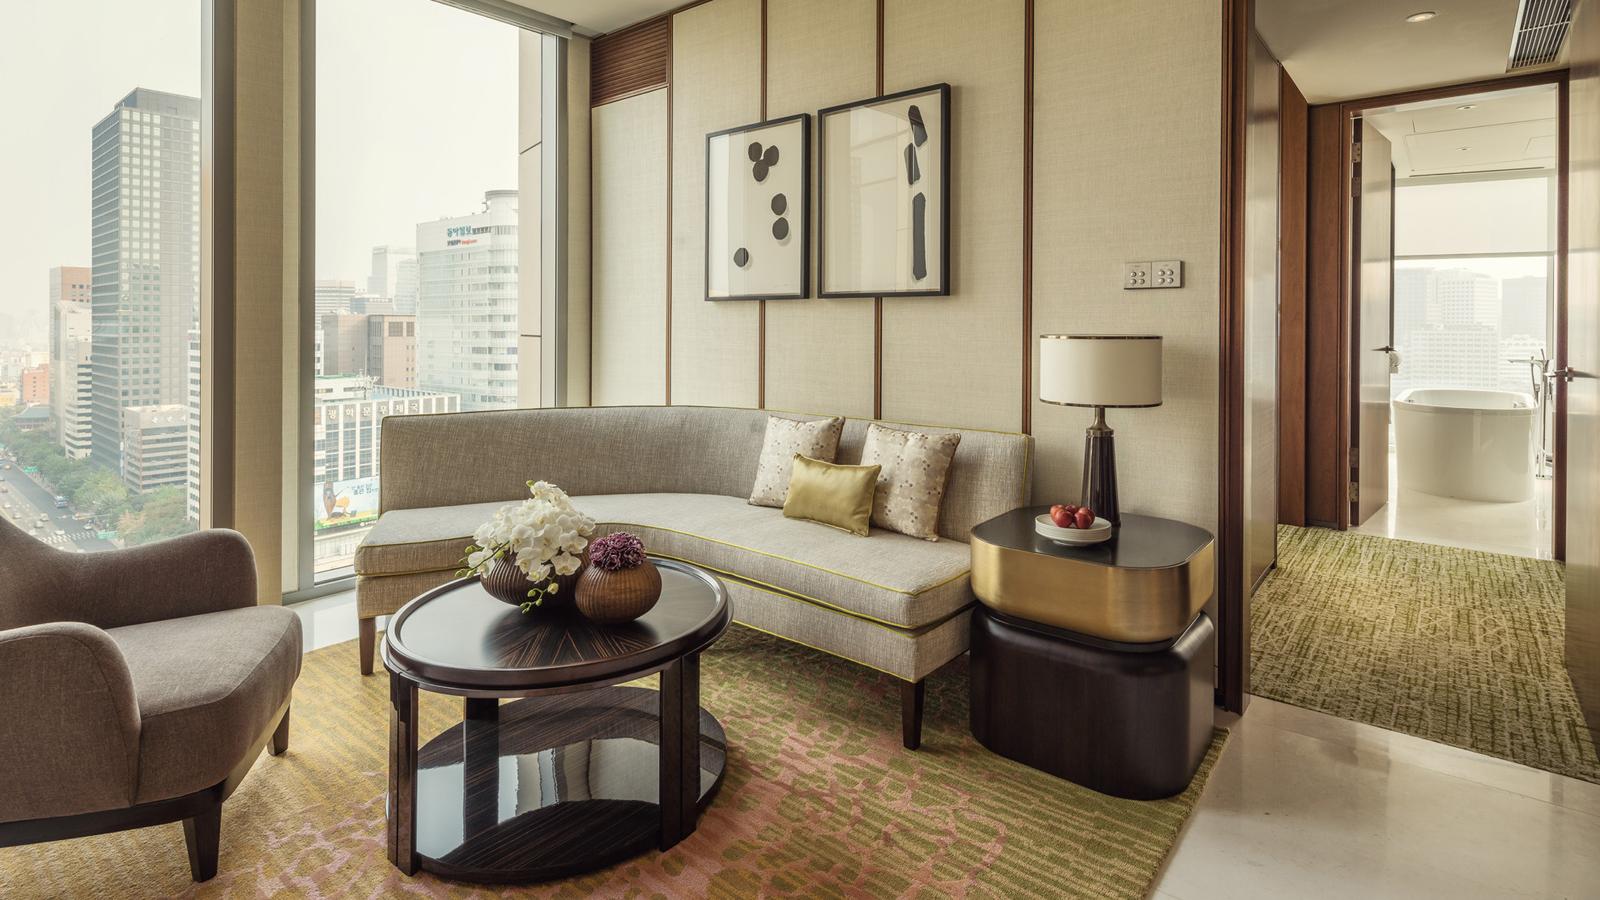 Stay Longer Third Night Free Four Seasons Seoul Luxury Hotel Room